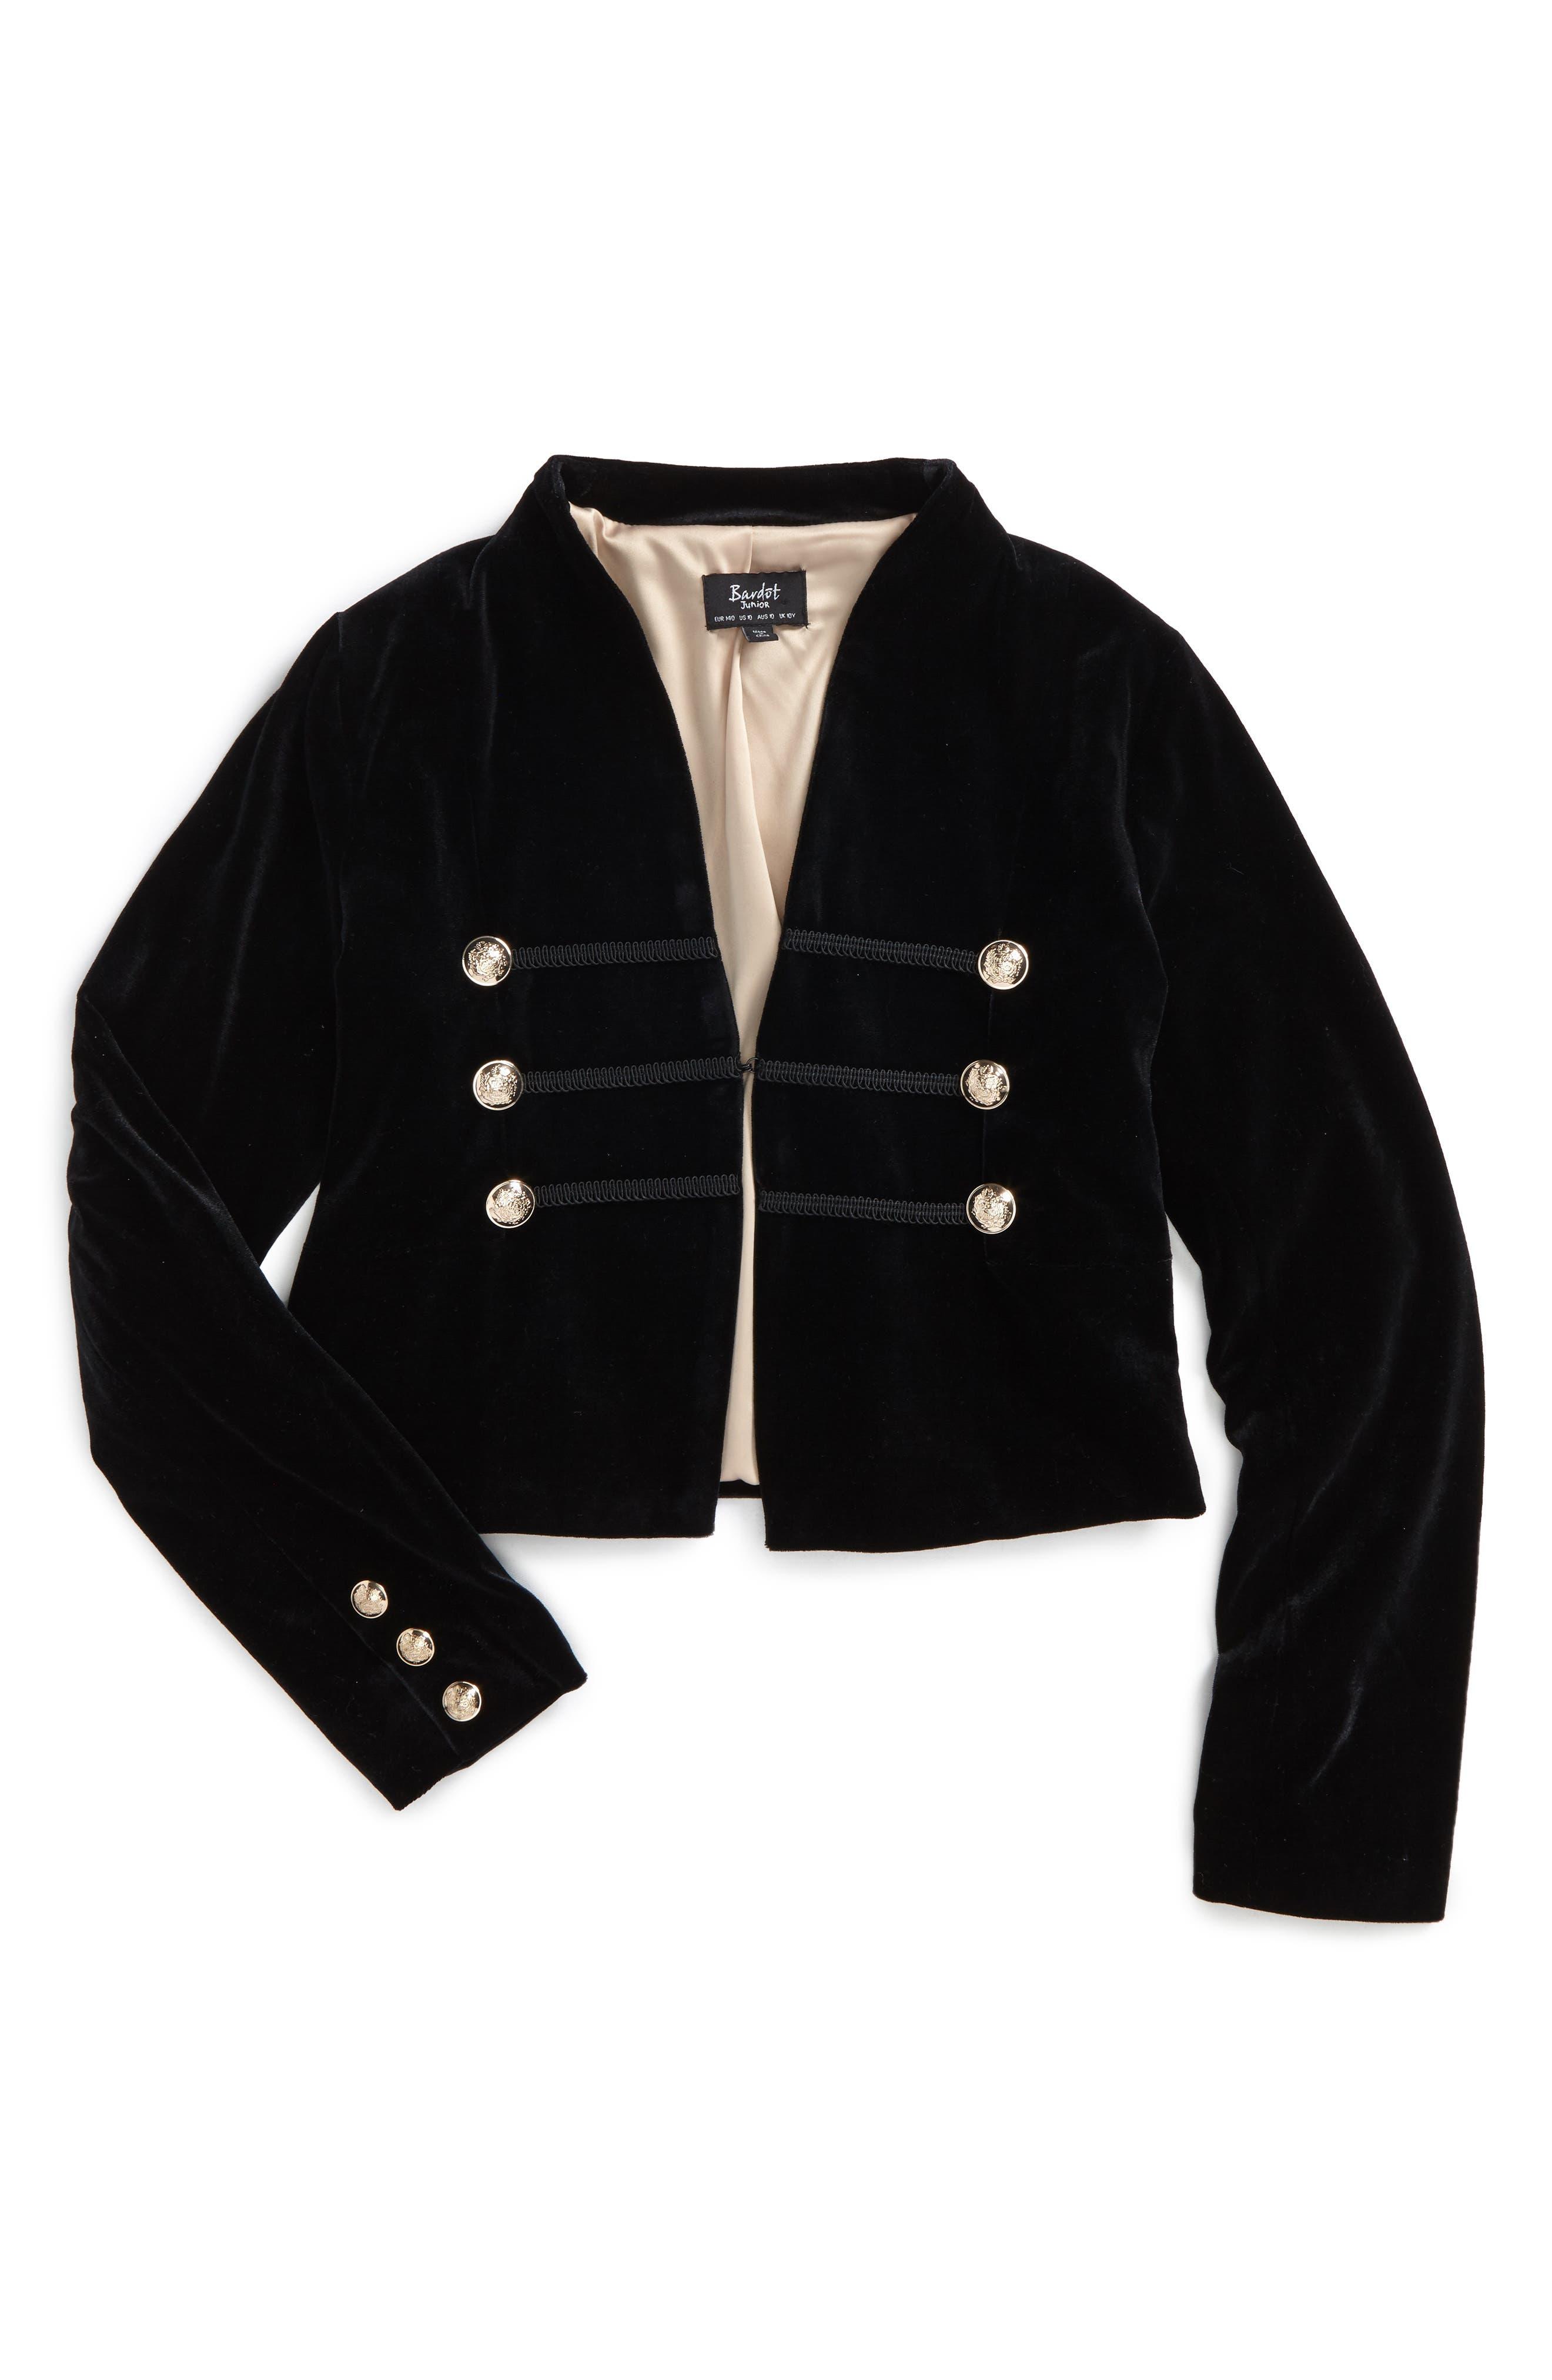 Alternate Image 1 Selected - Bardot Junior Military Jacket (Big Girls)